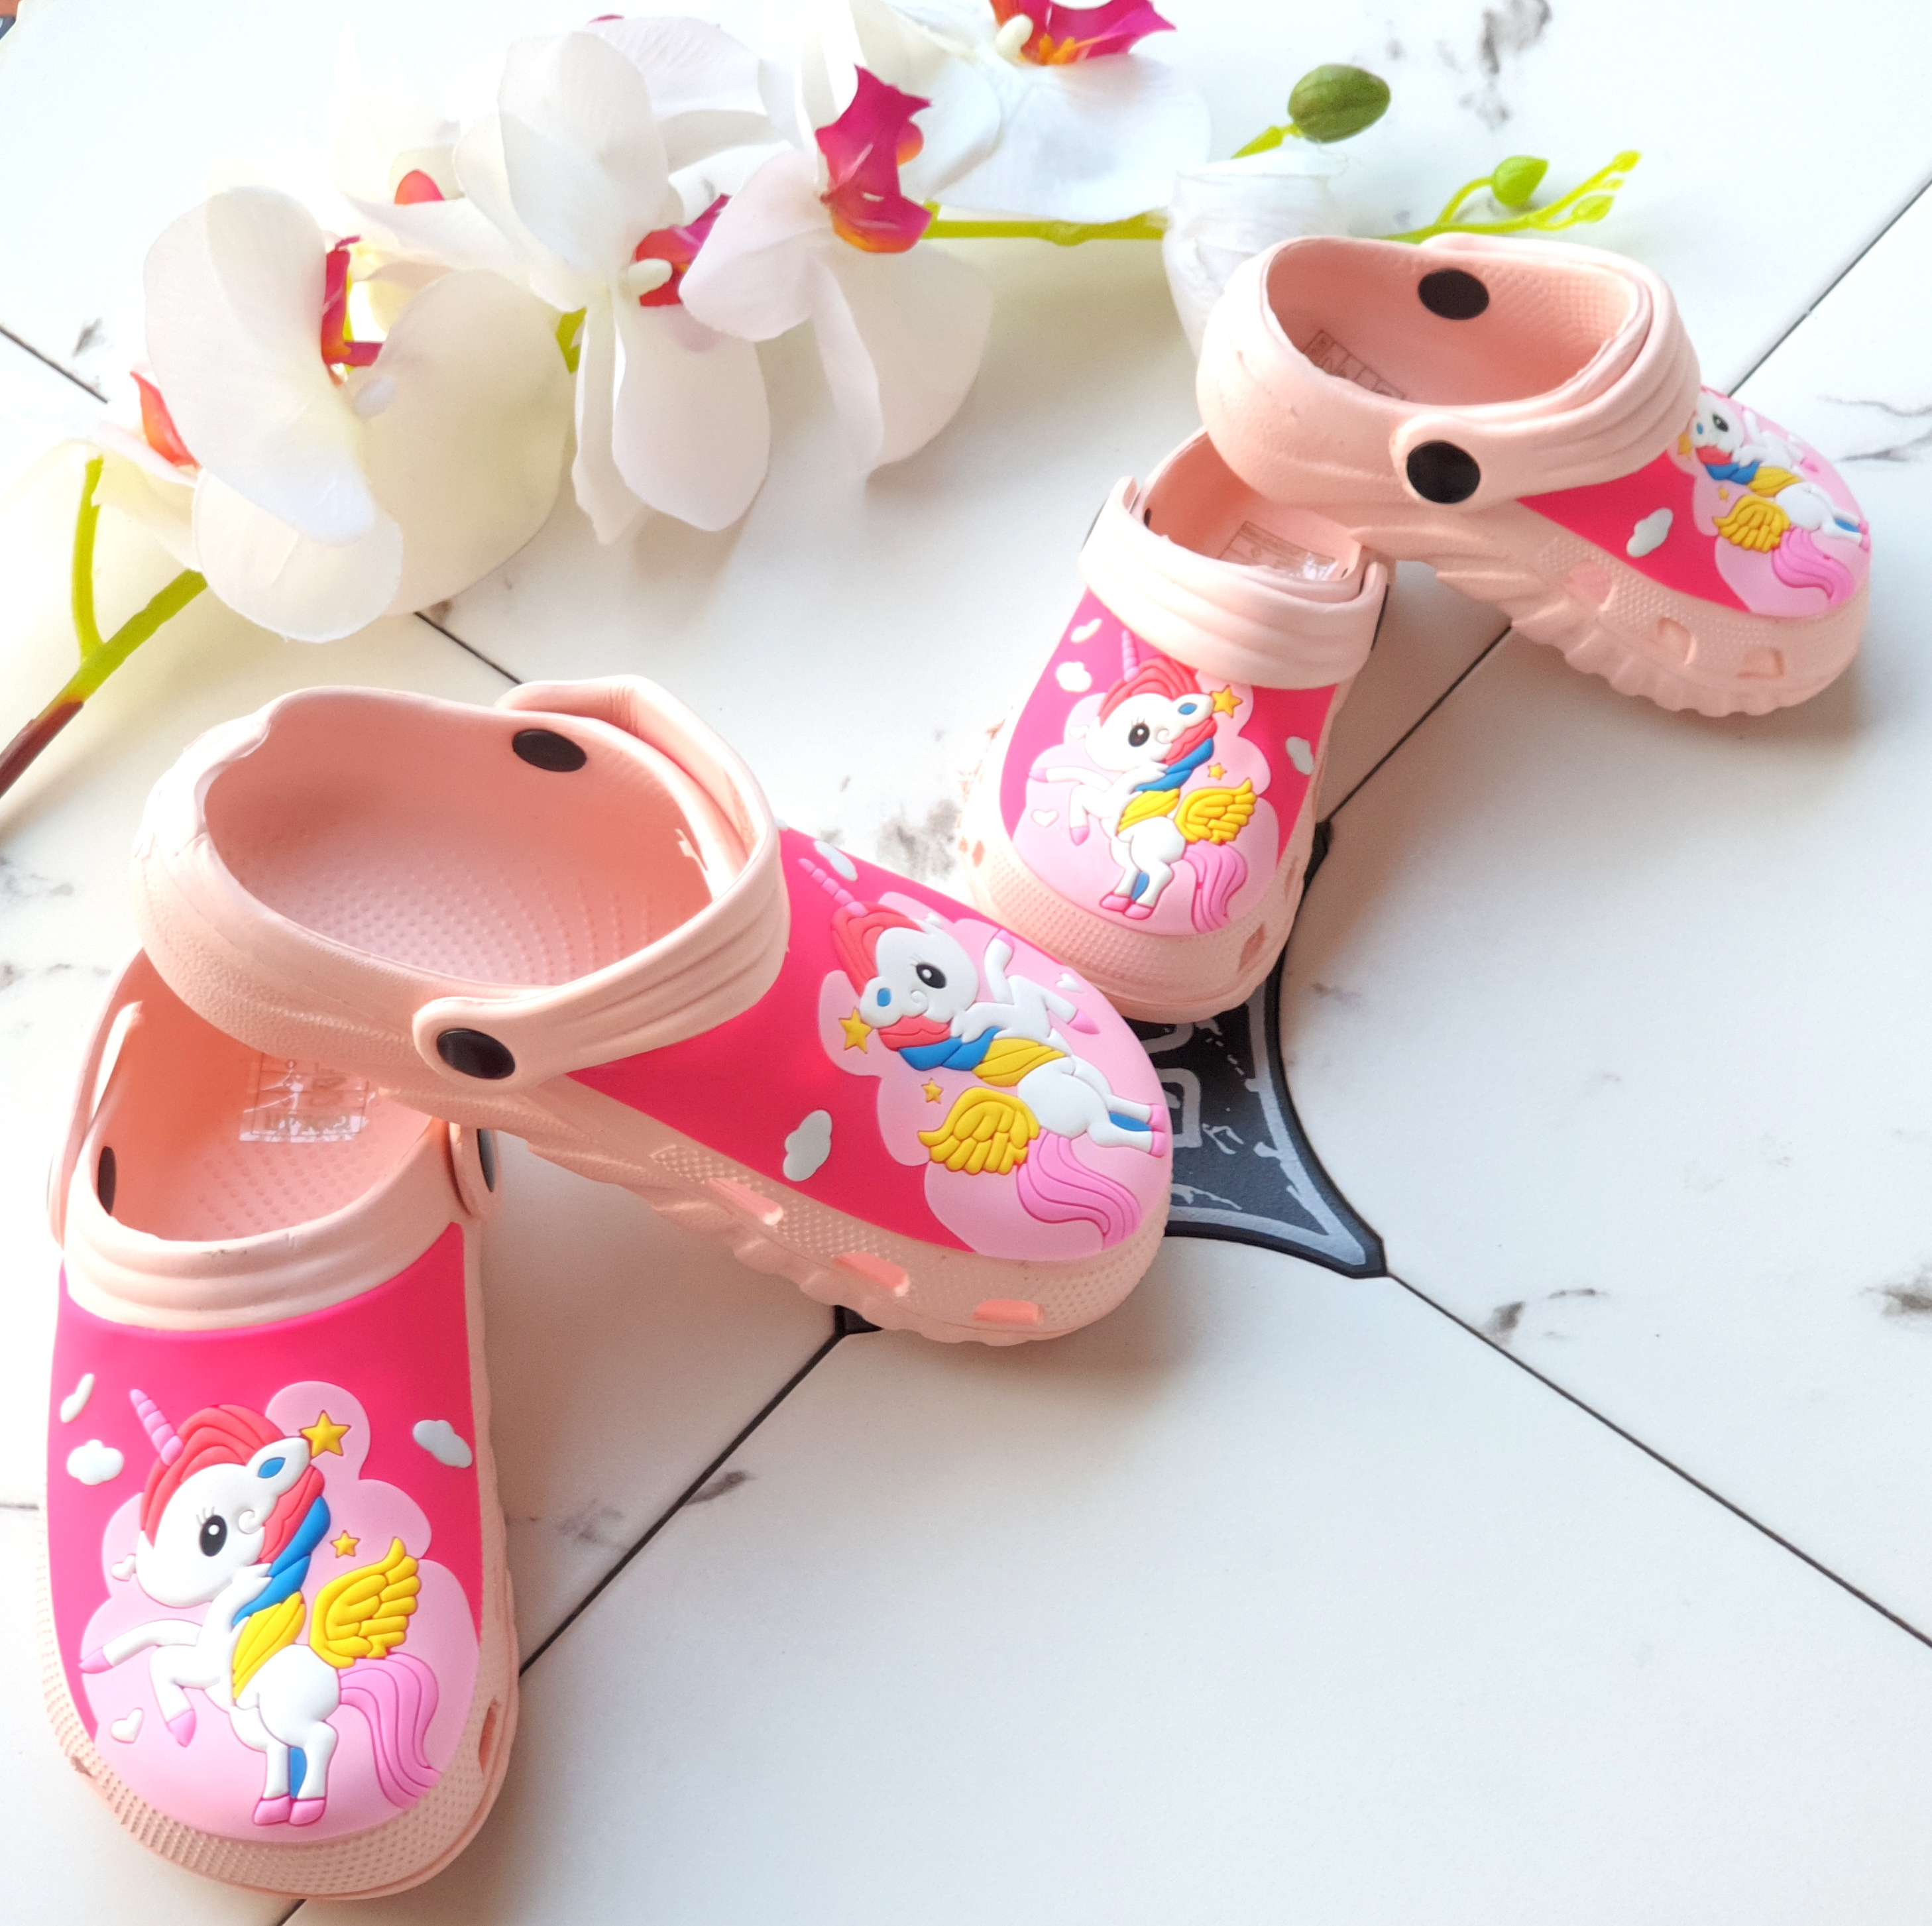 Magassarkú cipő AKCIÓS Termékek Luna Gardrobe Női ruha